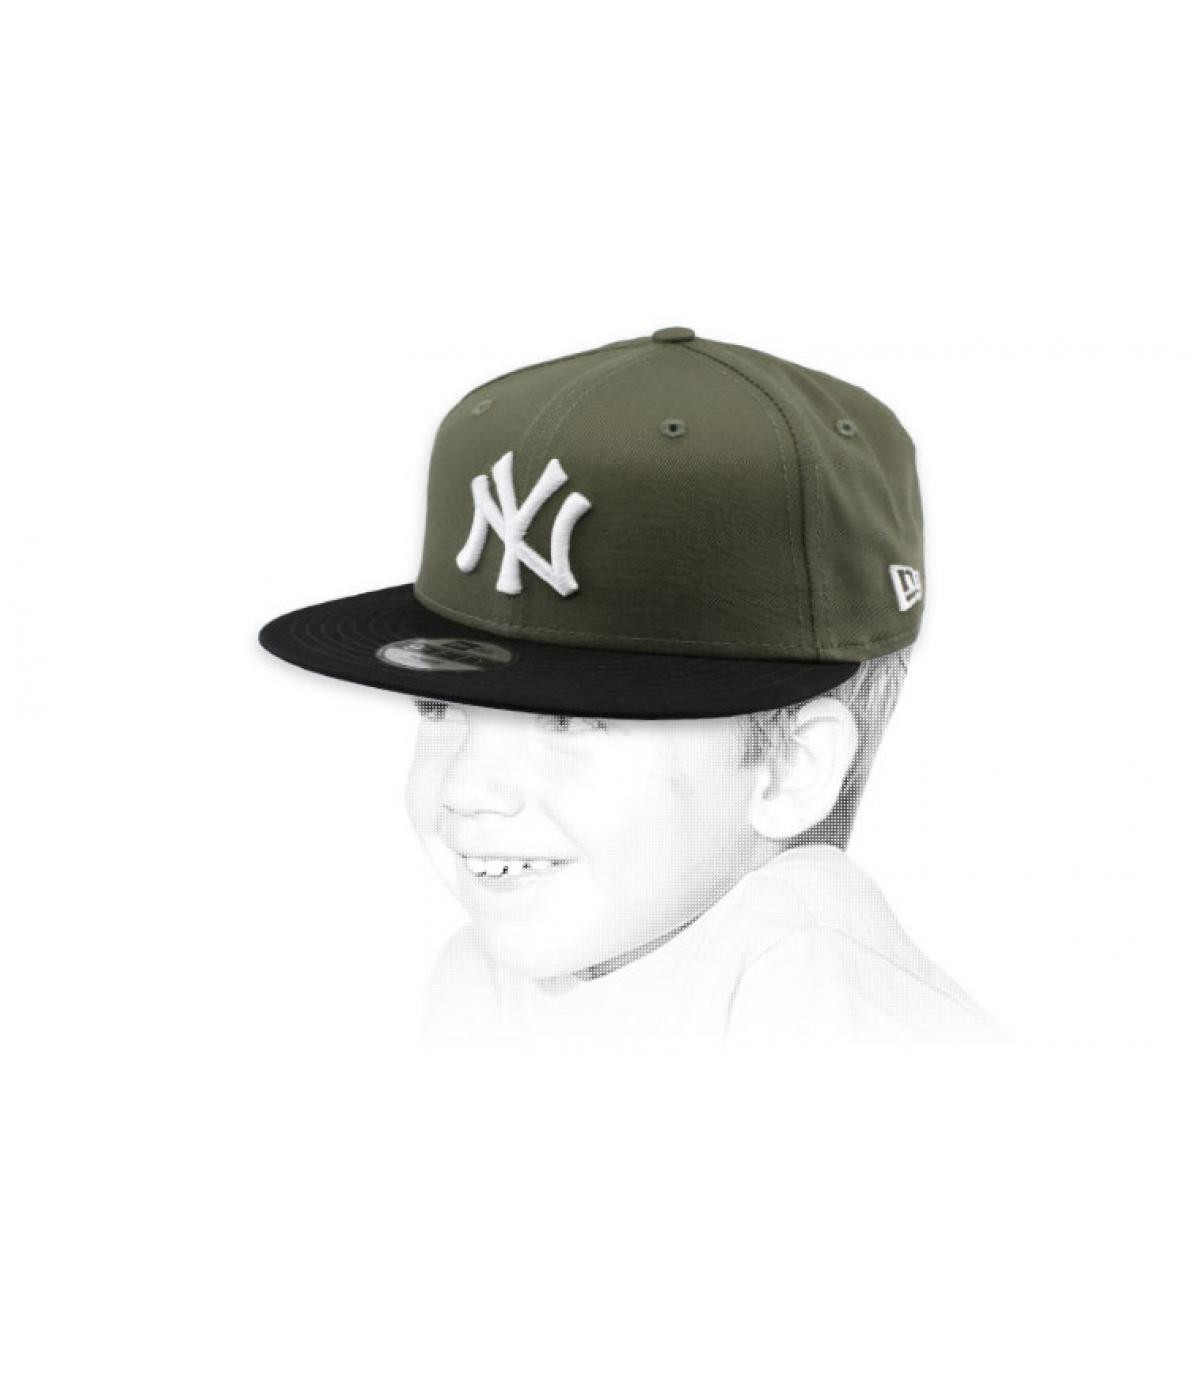 casquette enfant NY vert noir